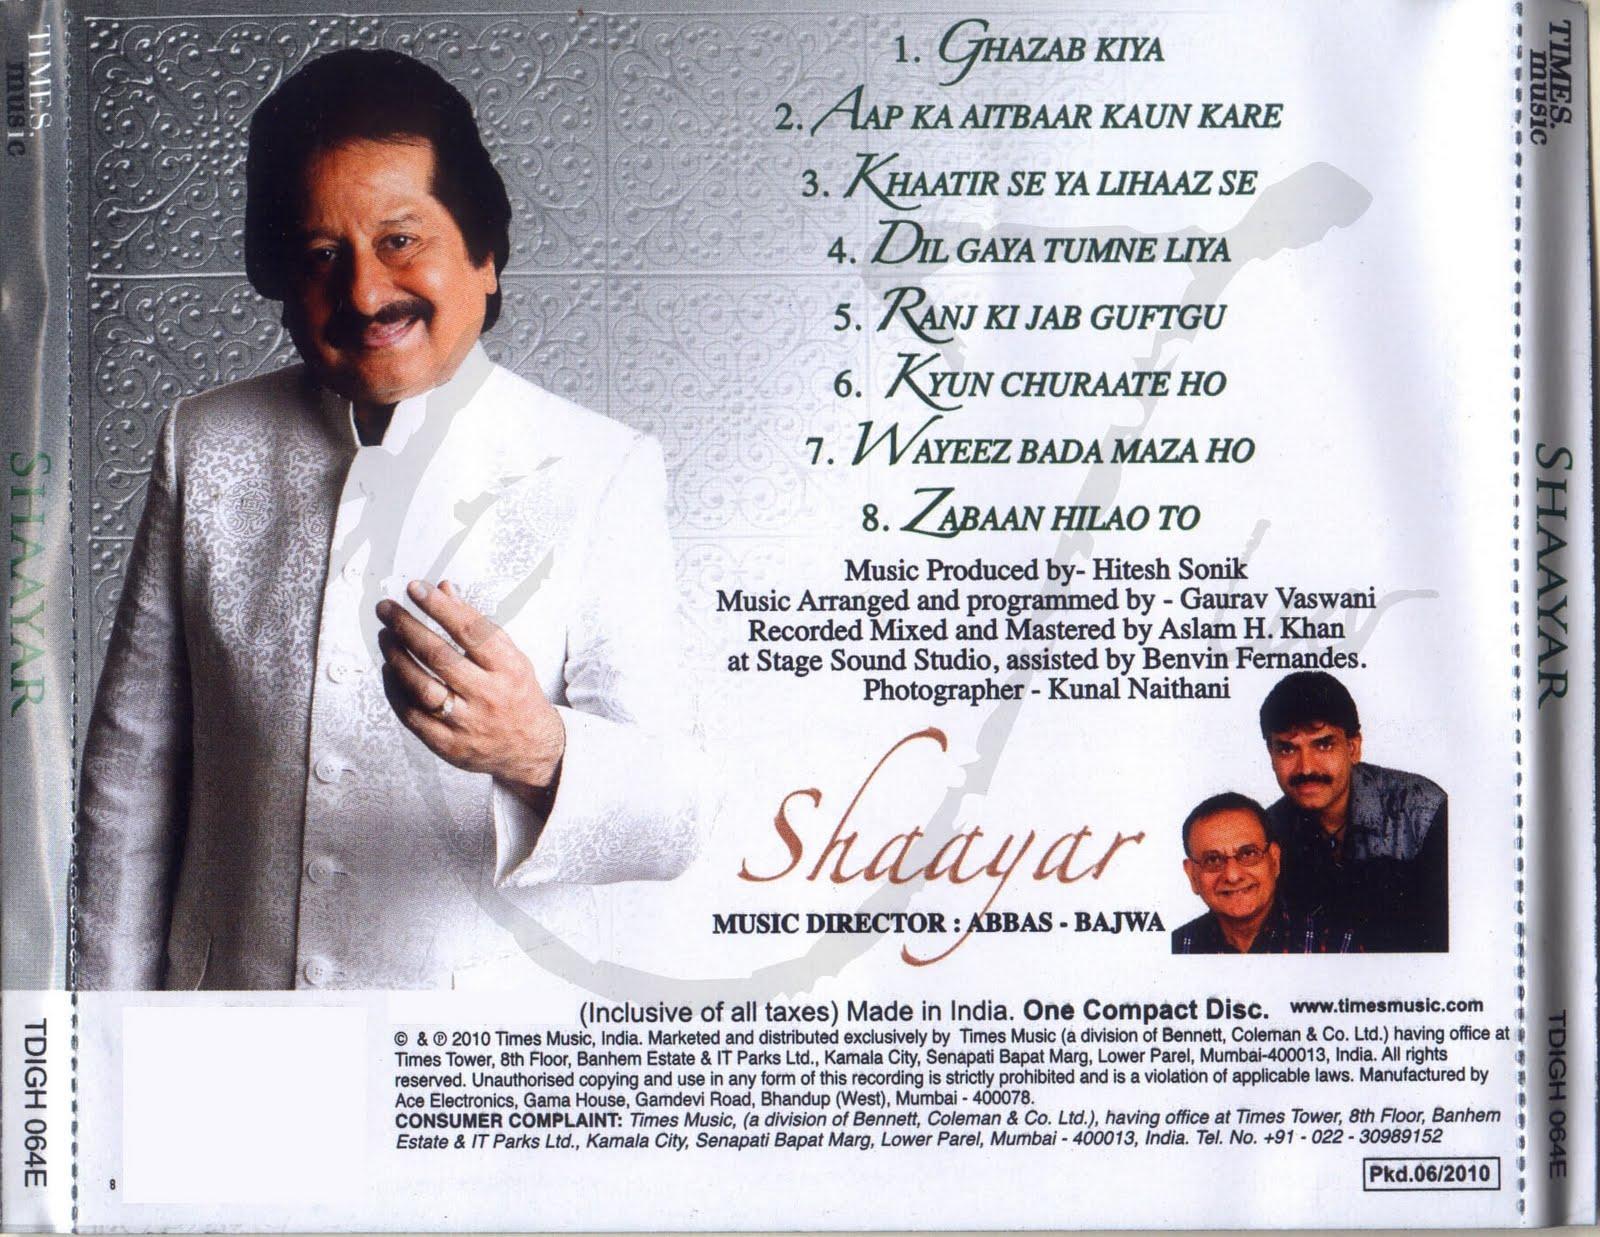 movies,music,downloads: Shaayar Pankaj Udhas 2010 Ghazal ...